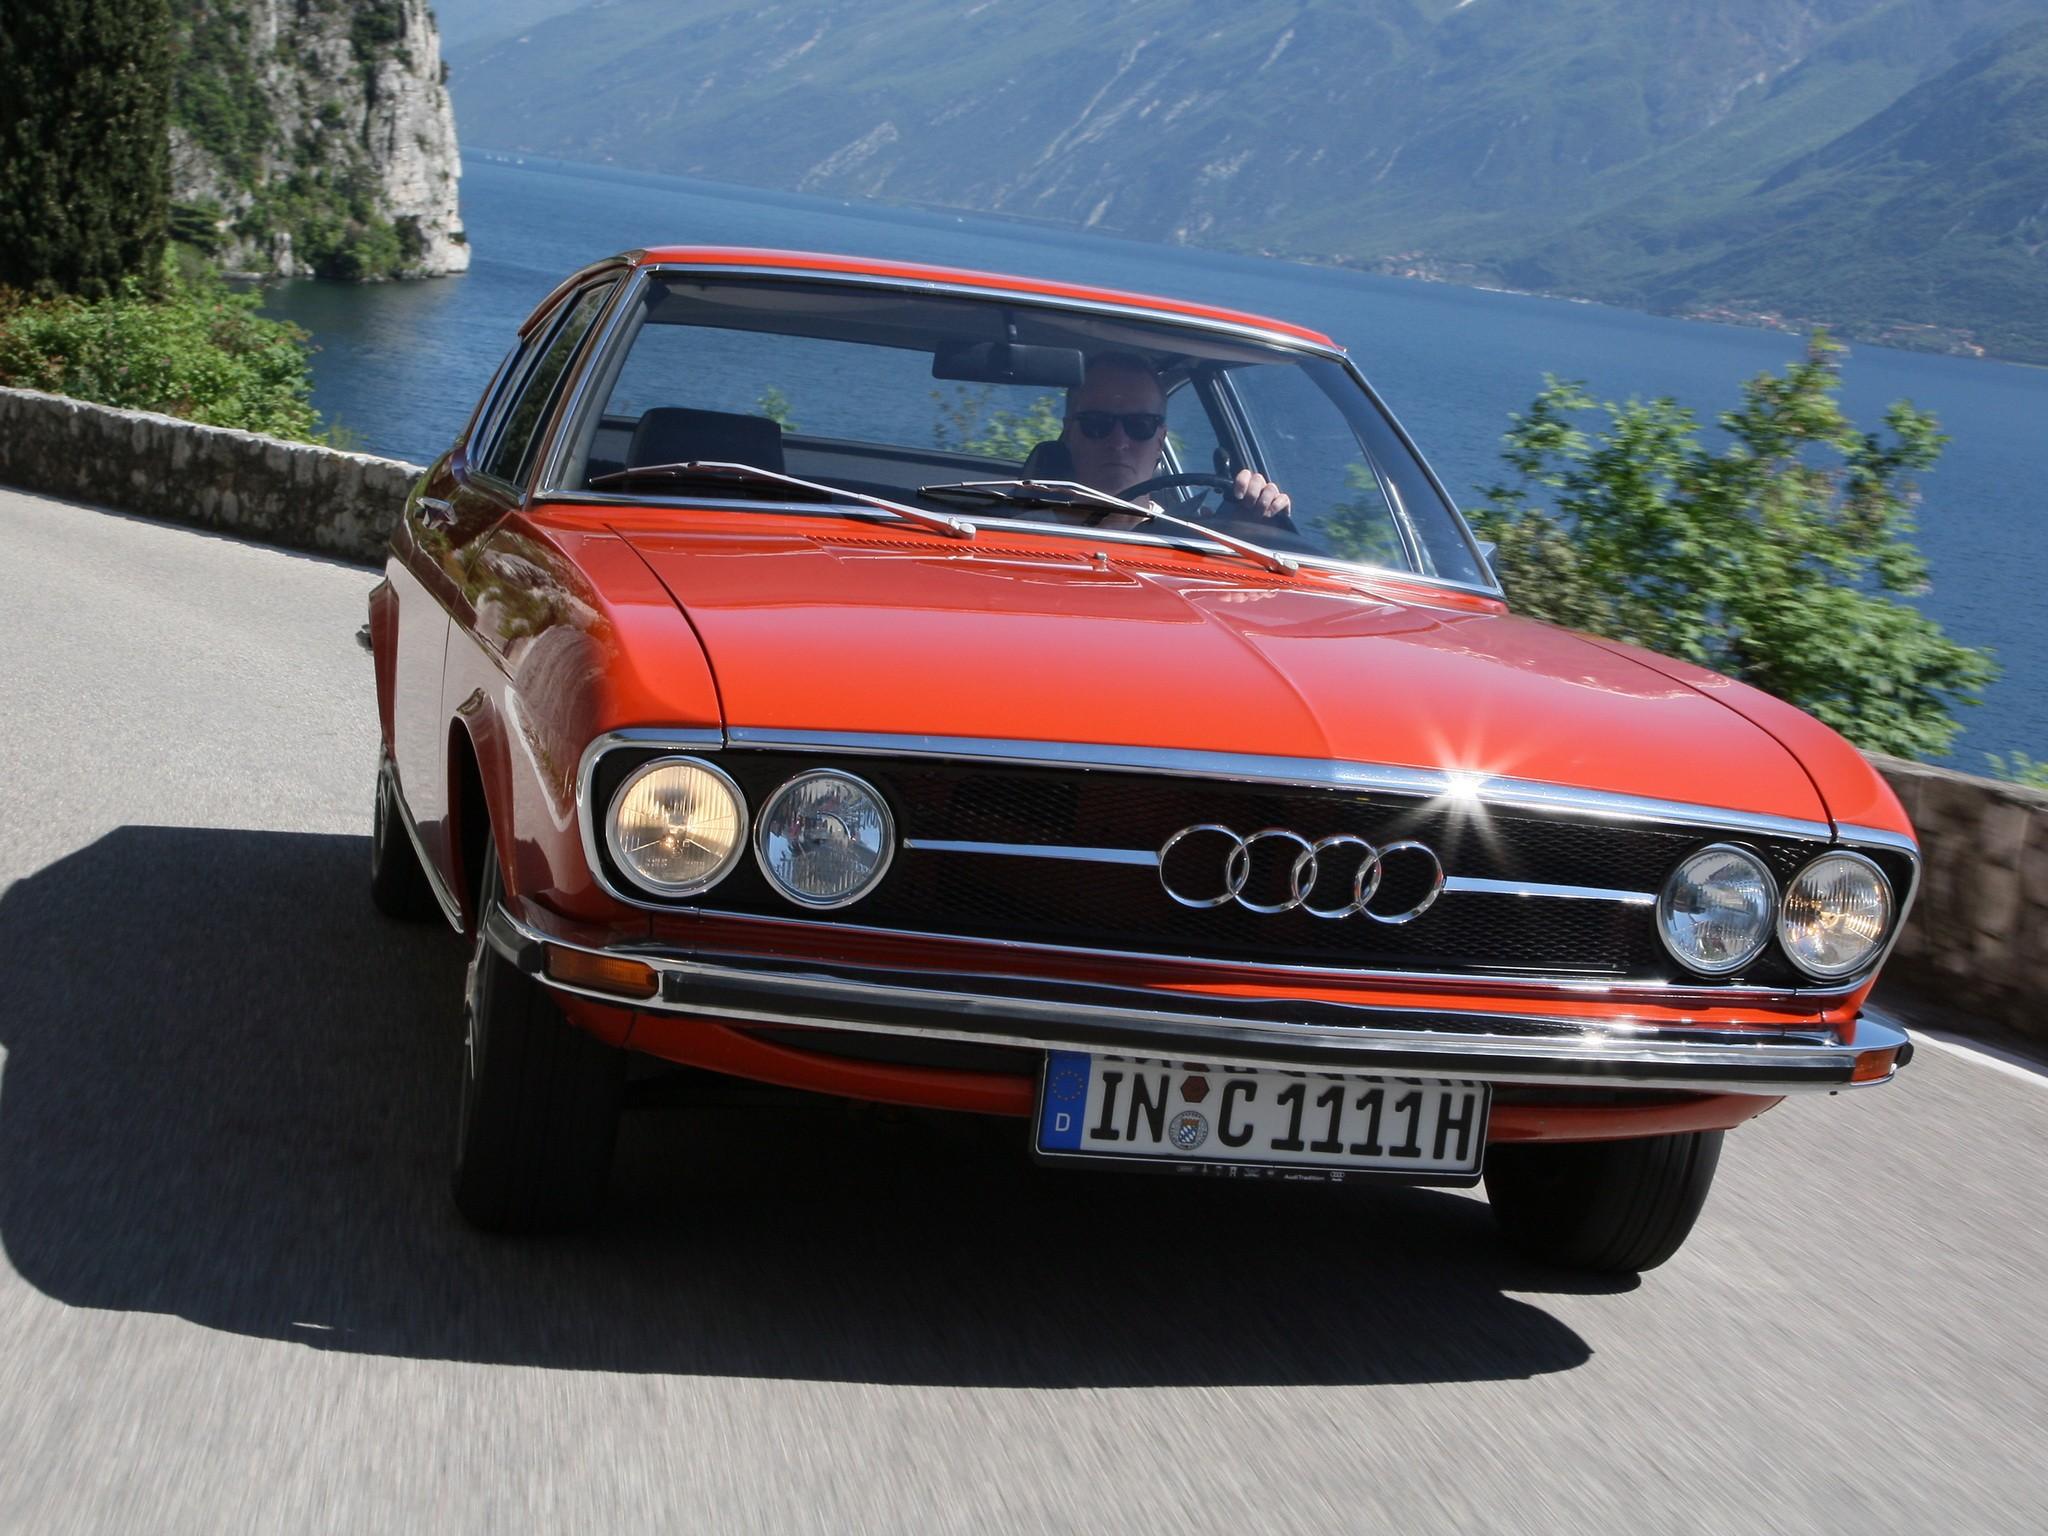 AUDI 100 Coupe S specs - 1970, 1971, 1972, 1973, 1974, 1975, 1976 - autoevolution